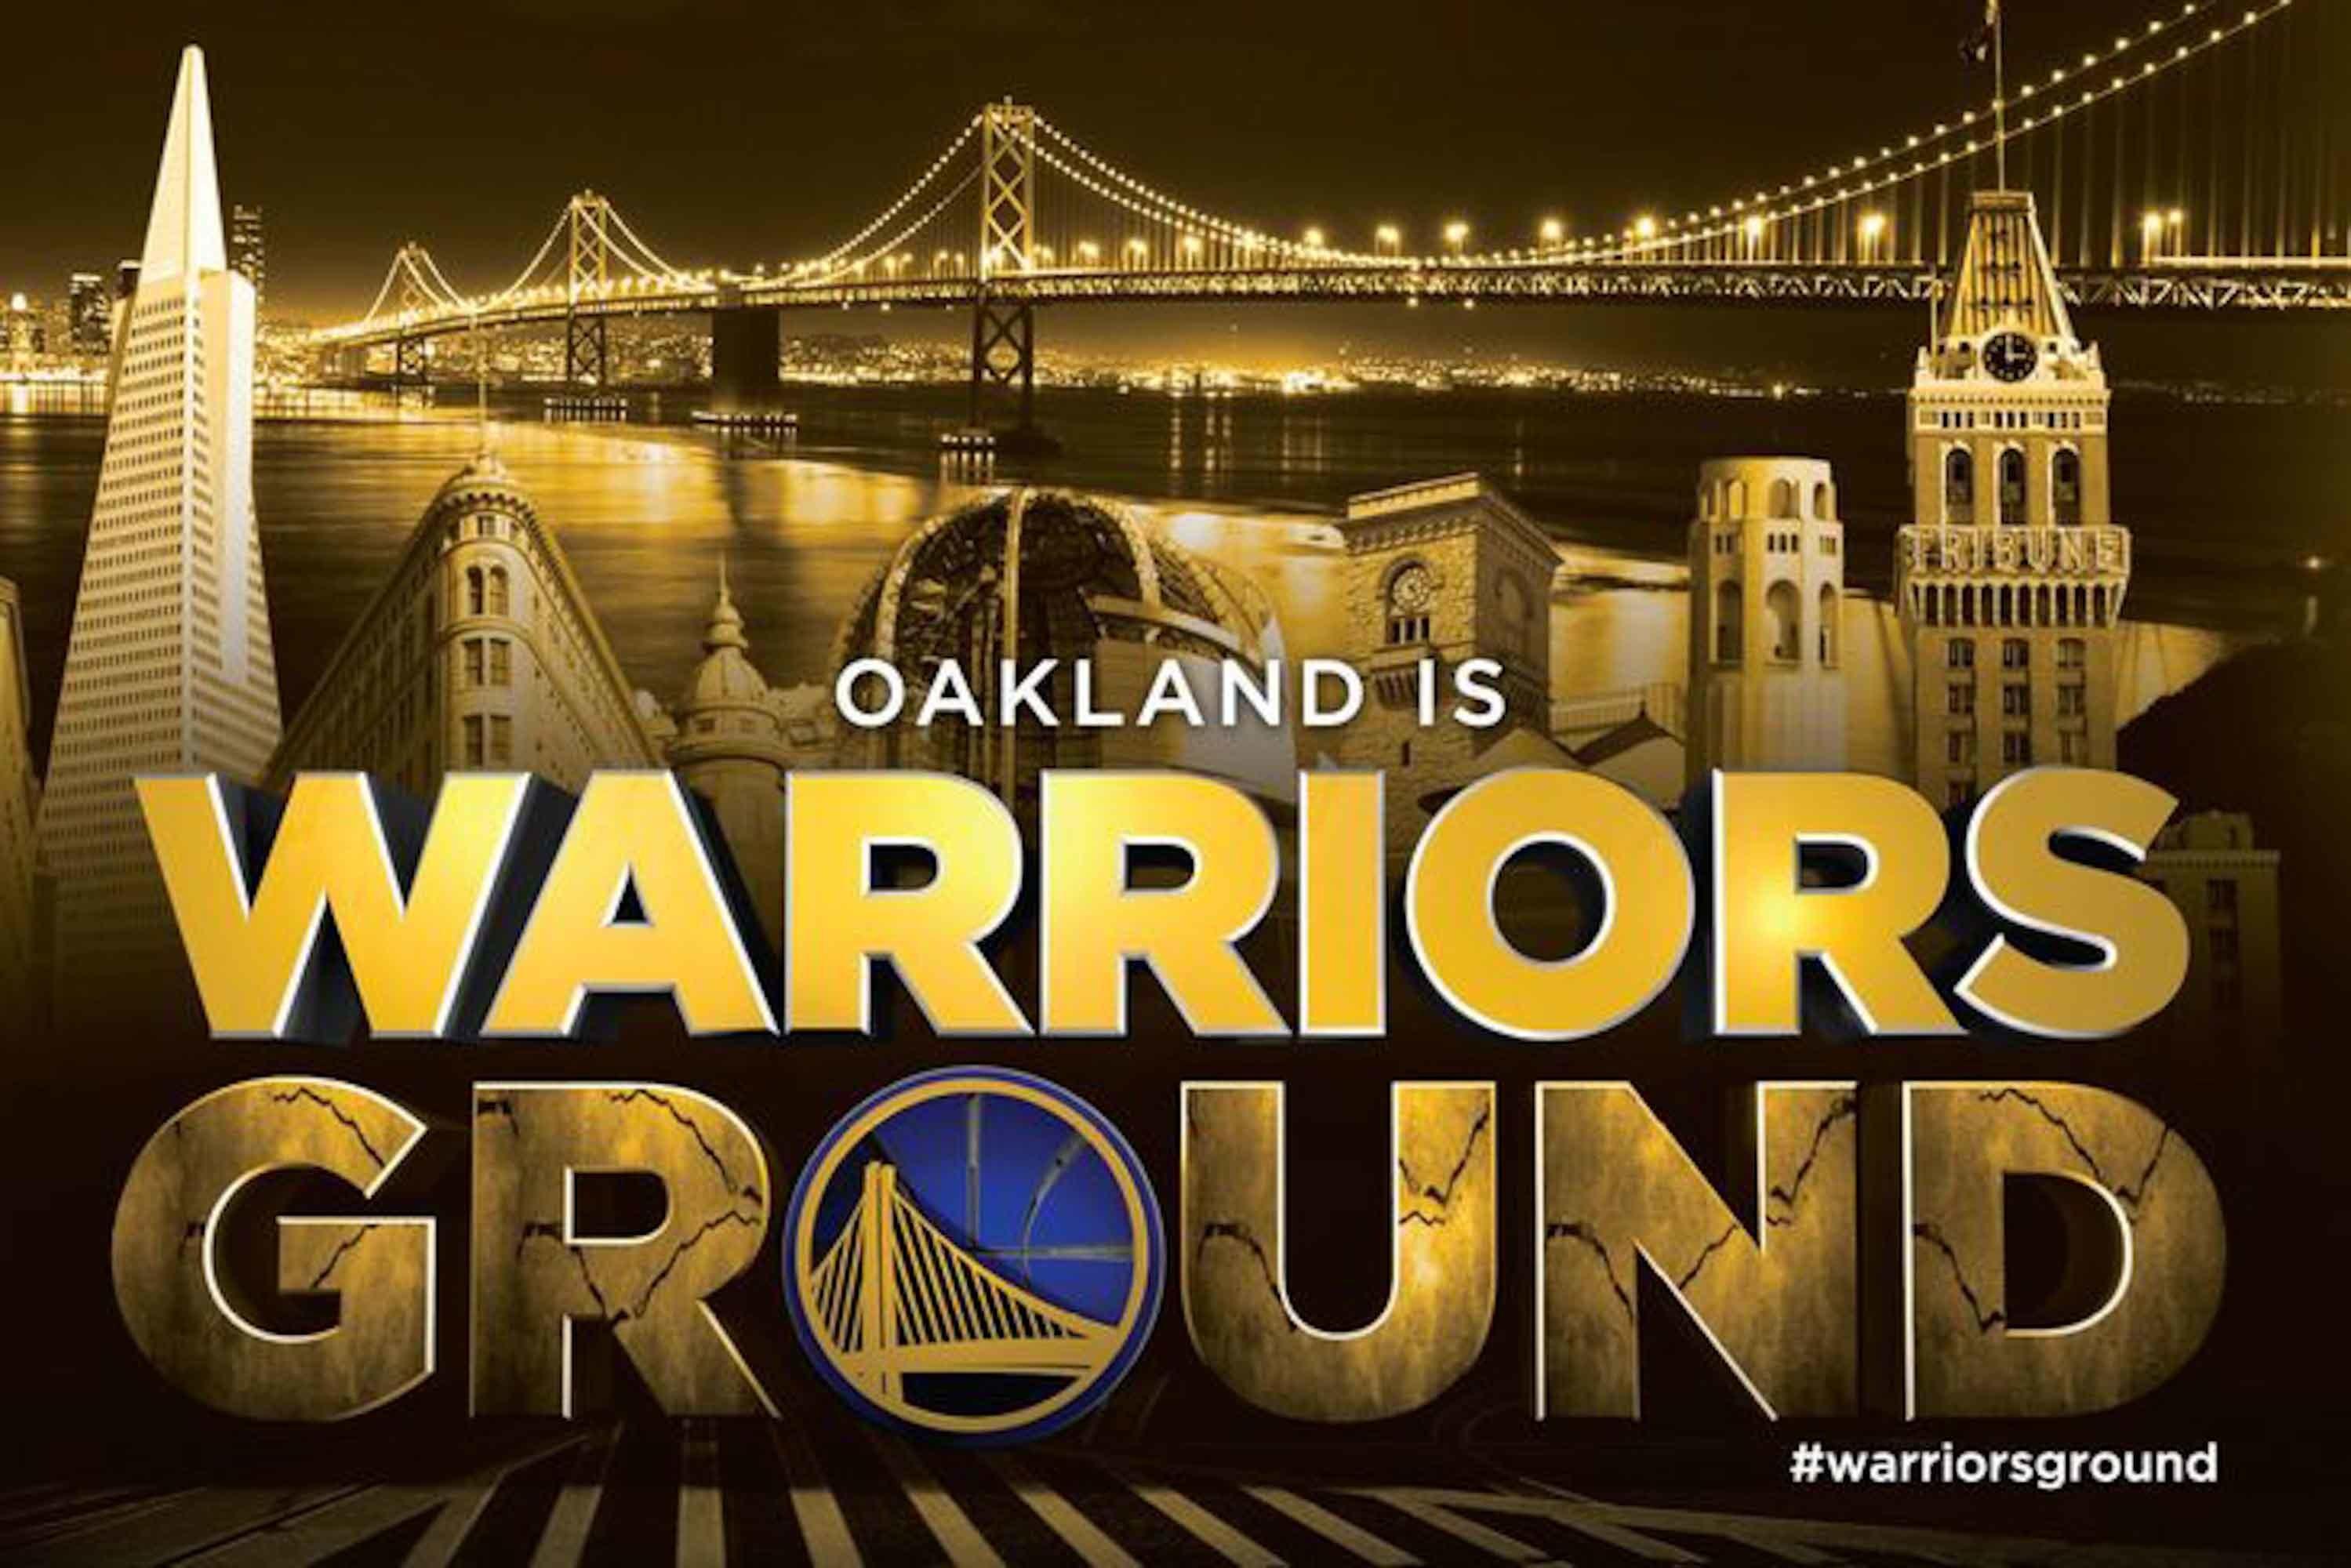 69 Golden State Warriors Iphone